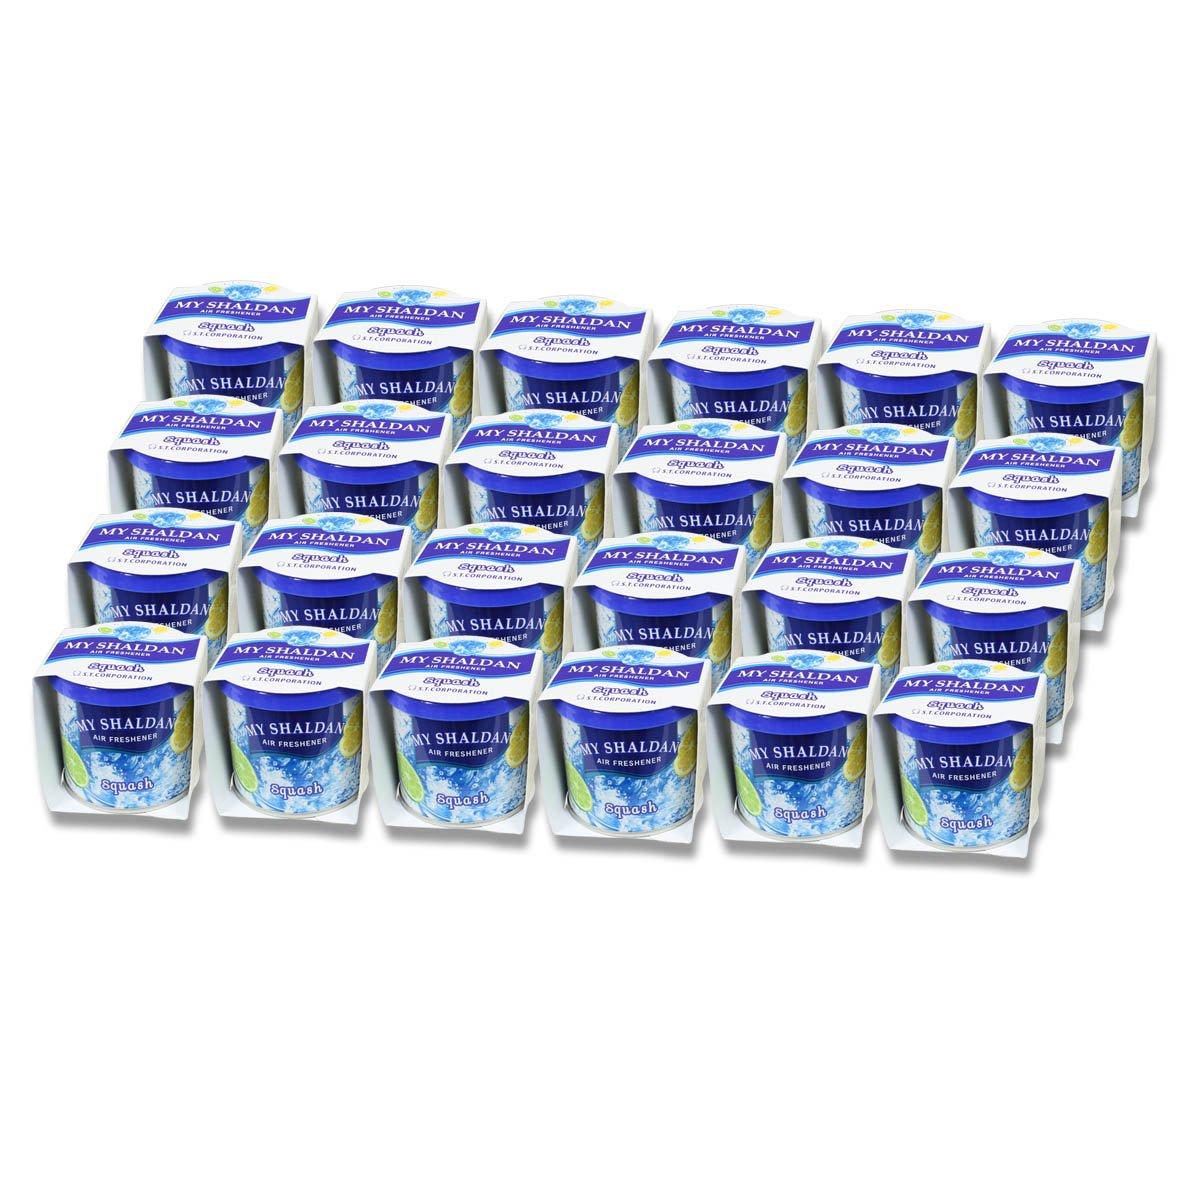 (Pack of 24) My Shaldan Japanese Car Natural Air Freshener Cans (Squash)